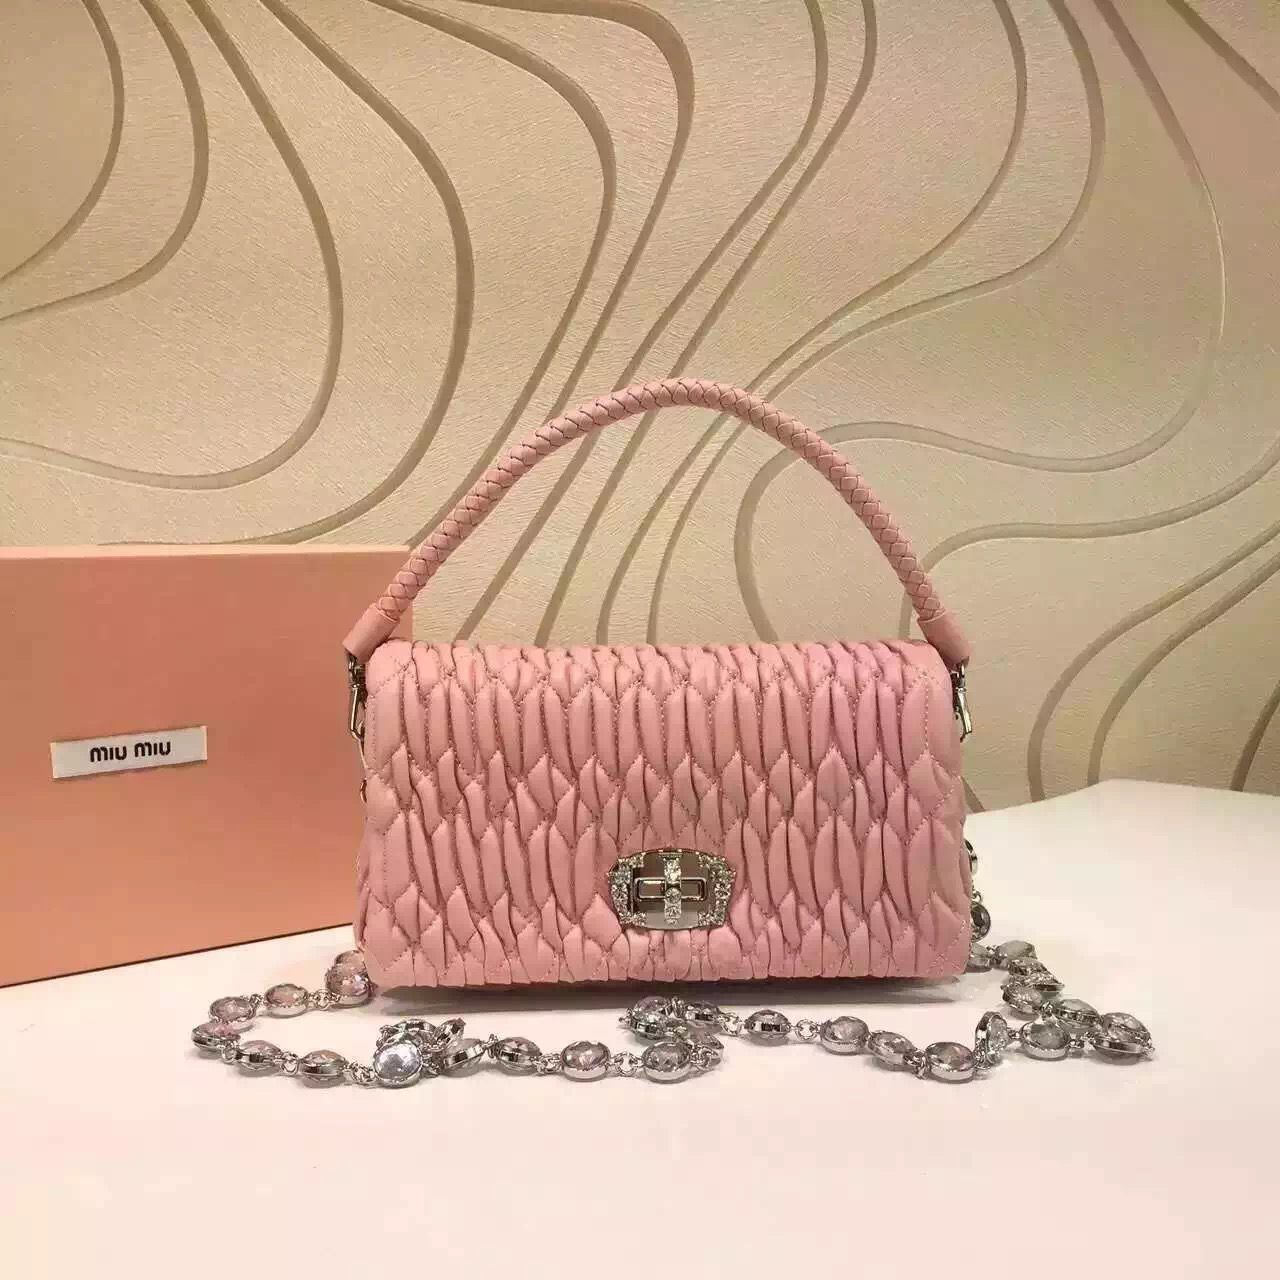 Miu Miu Lambskin Shoulder Bag 5BH012 Pink 2016   Miu Miu Pink Bag in ... 76279619e6